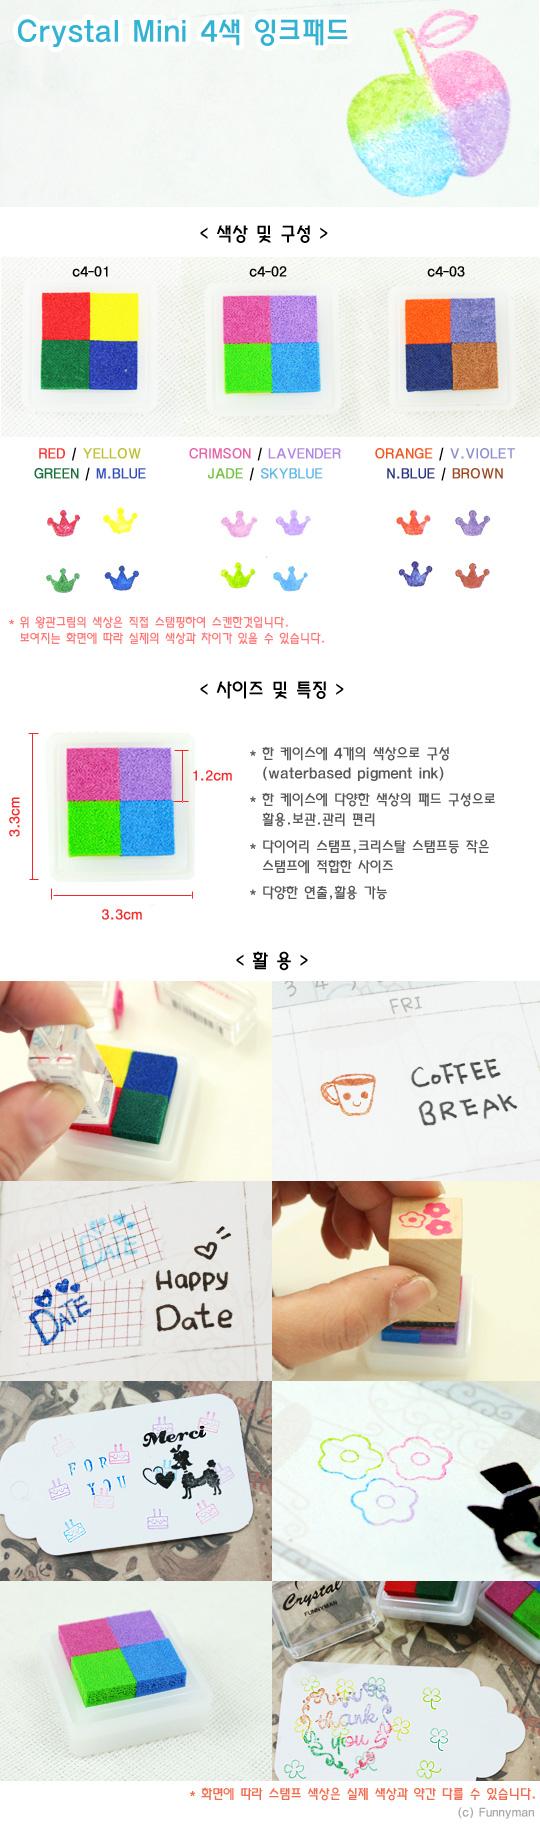 Mini 4색 잉크패드 3TYPE - 퍼니맨, 2,400원, 스탬프, 씰링/잉크